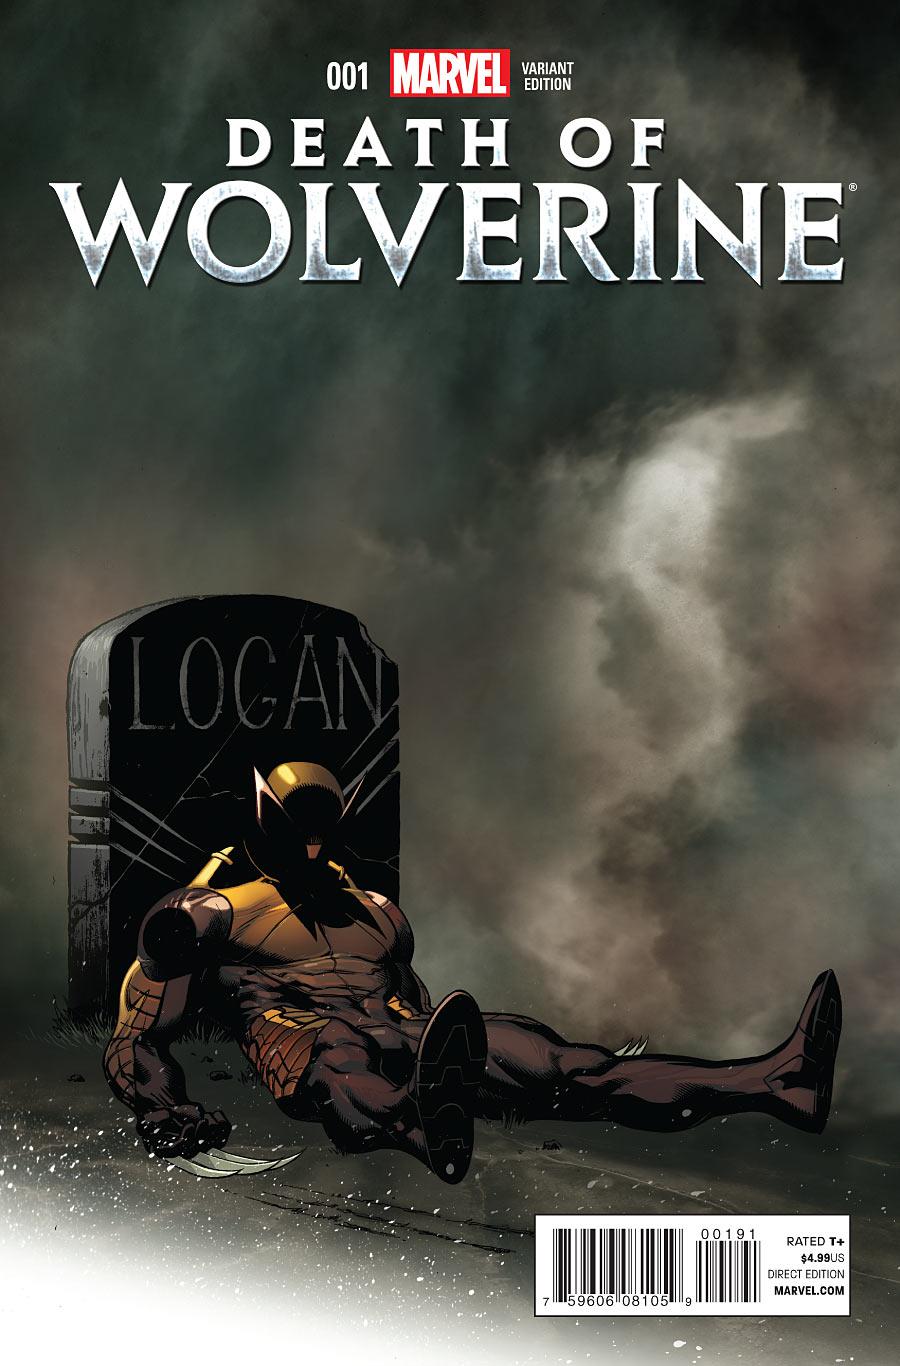 La Mort de Wolverine 1 - Death of Wolverine Part One (Ed Mc Guinness Variant Cover)